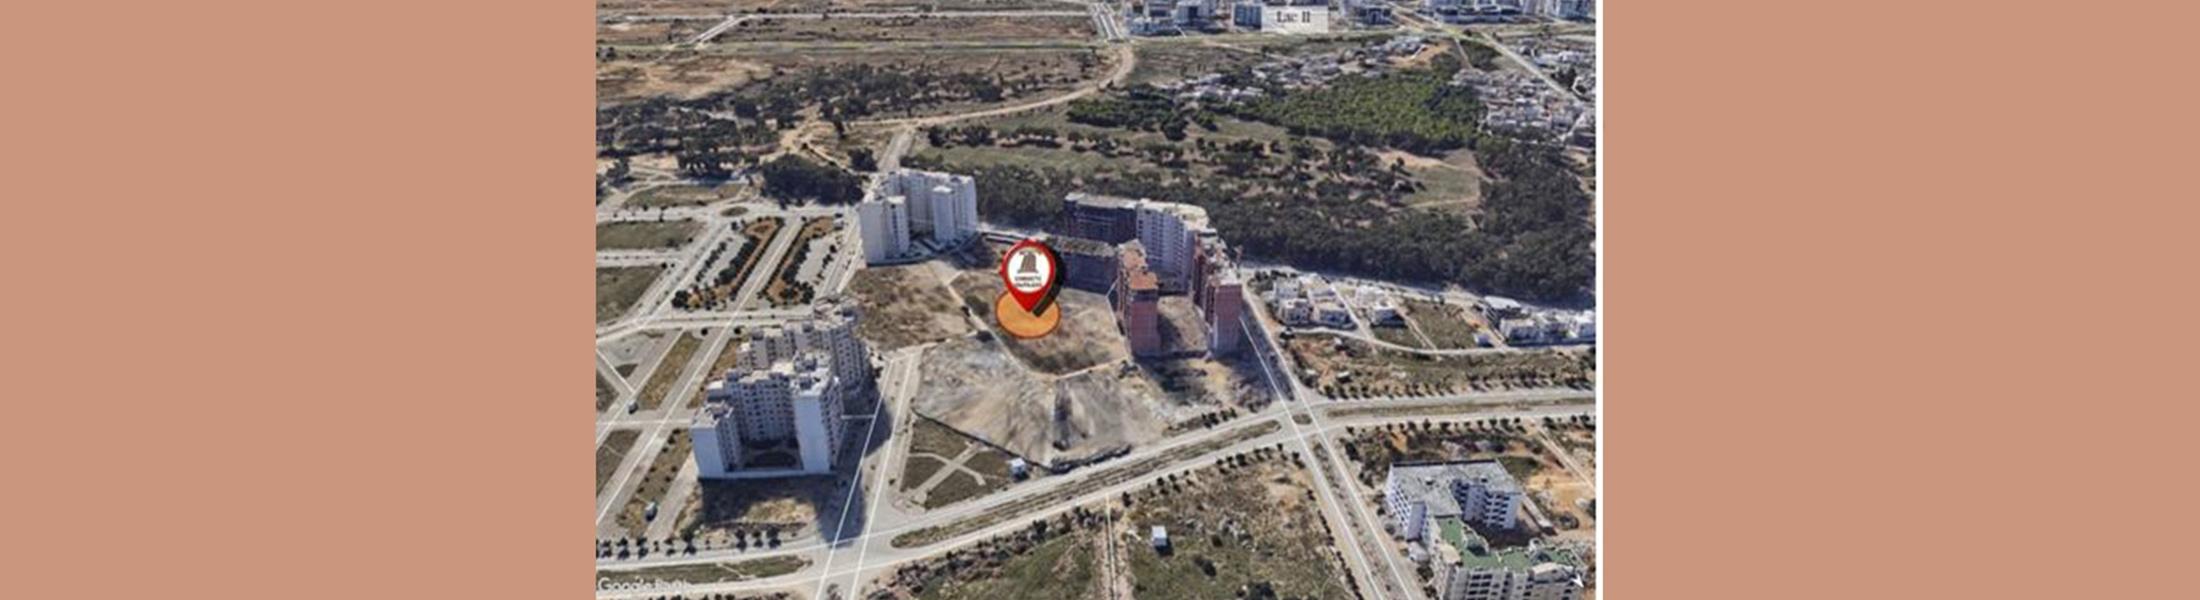 Terrain Les Jardins - Jardin de Carthage (Appel d'Offres N° 08/2020)